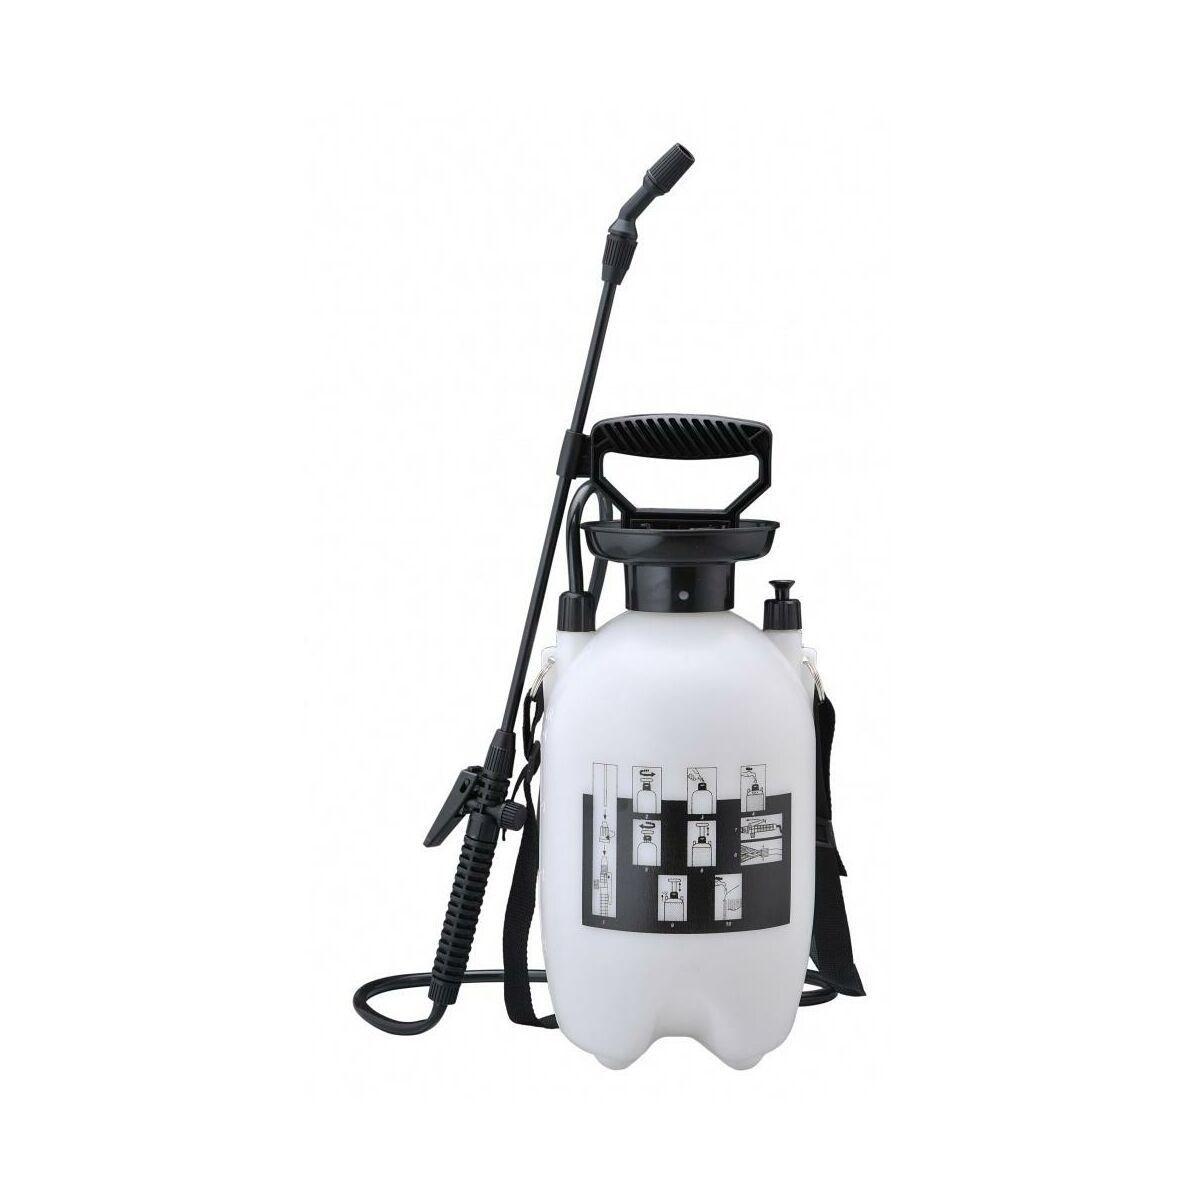 Opryskiwacz ciśnieniowy 4 l TUP5LB